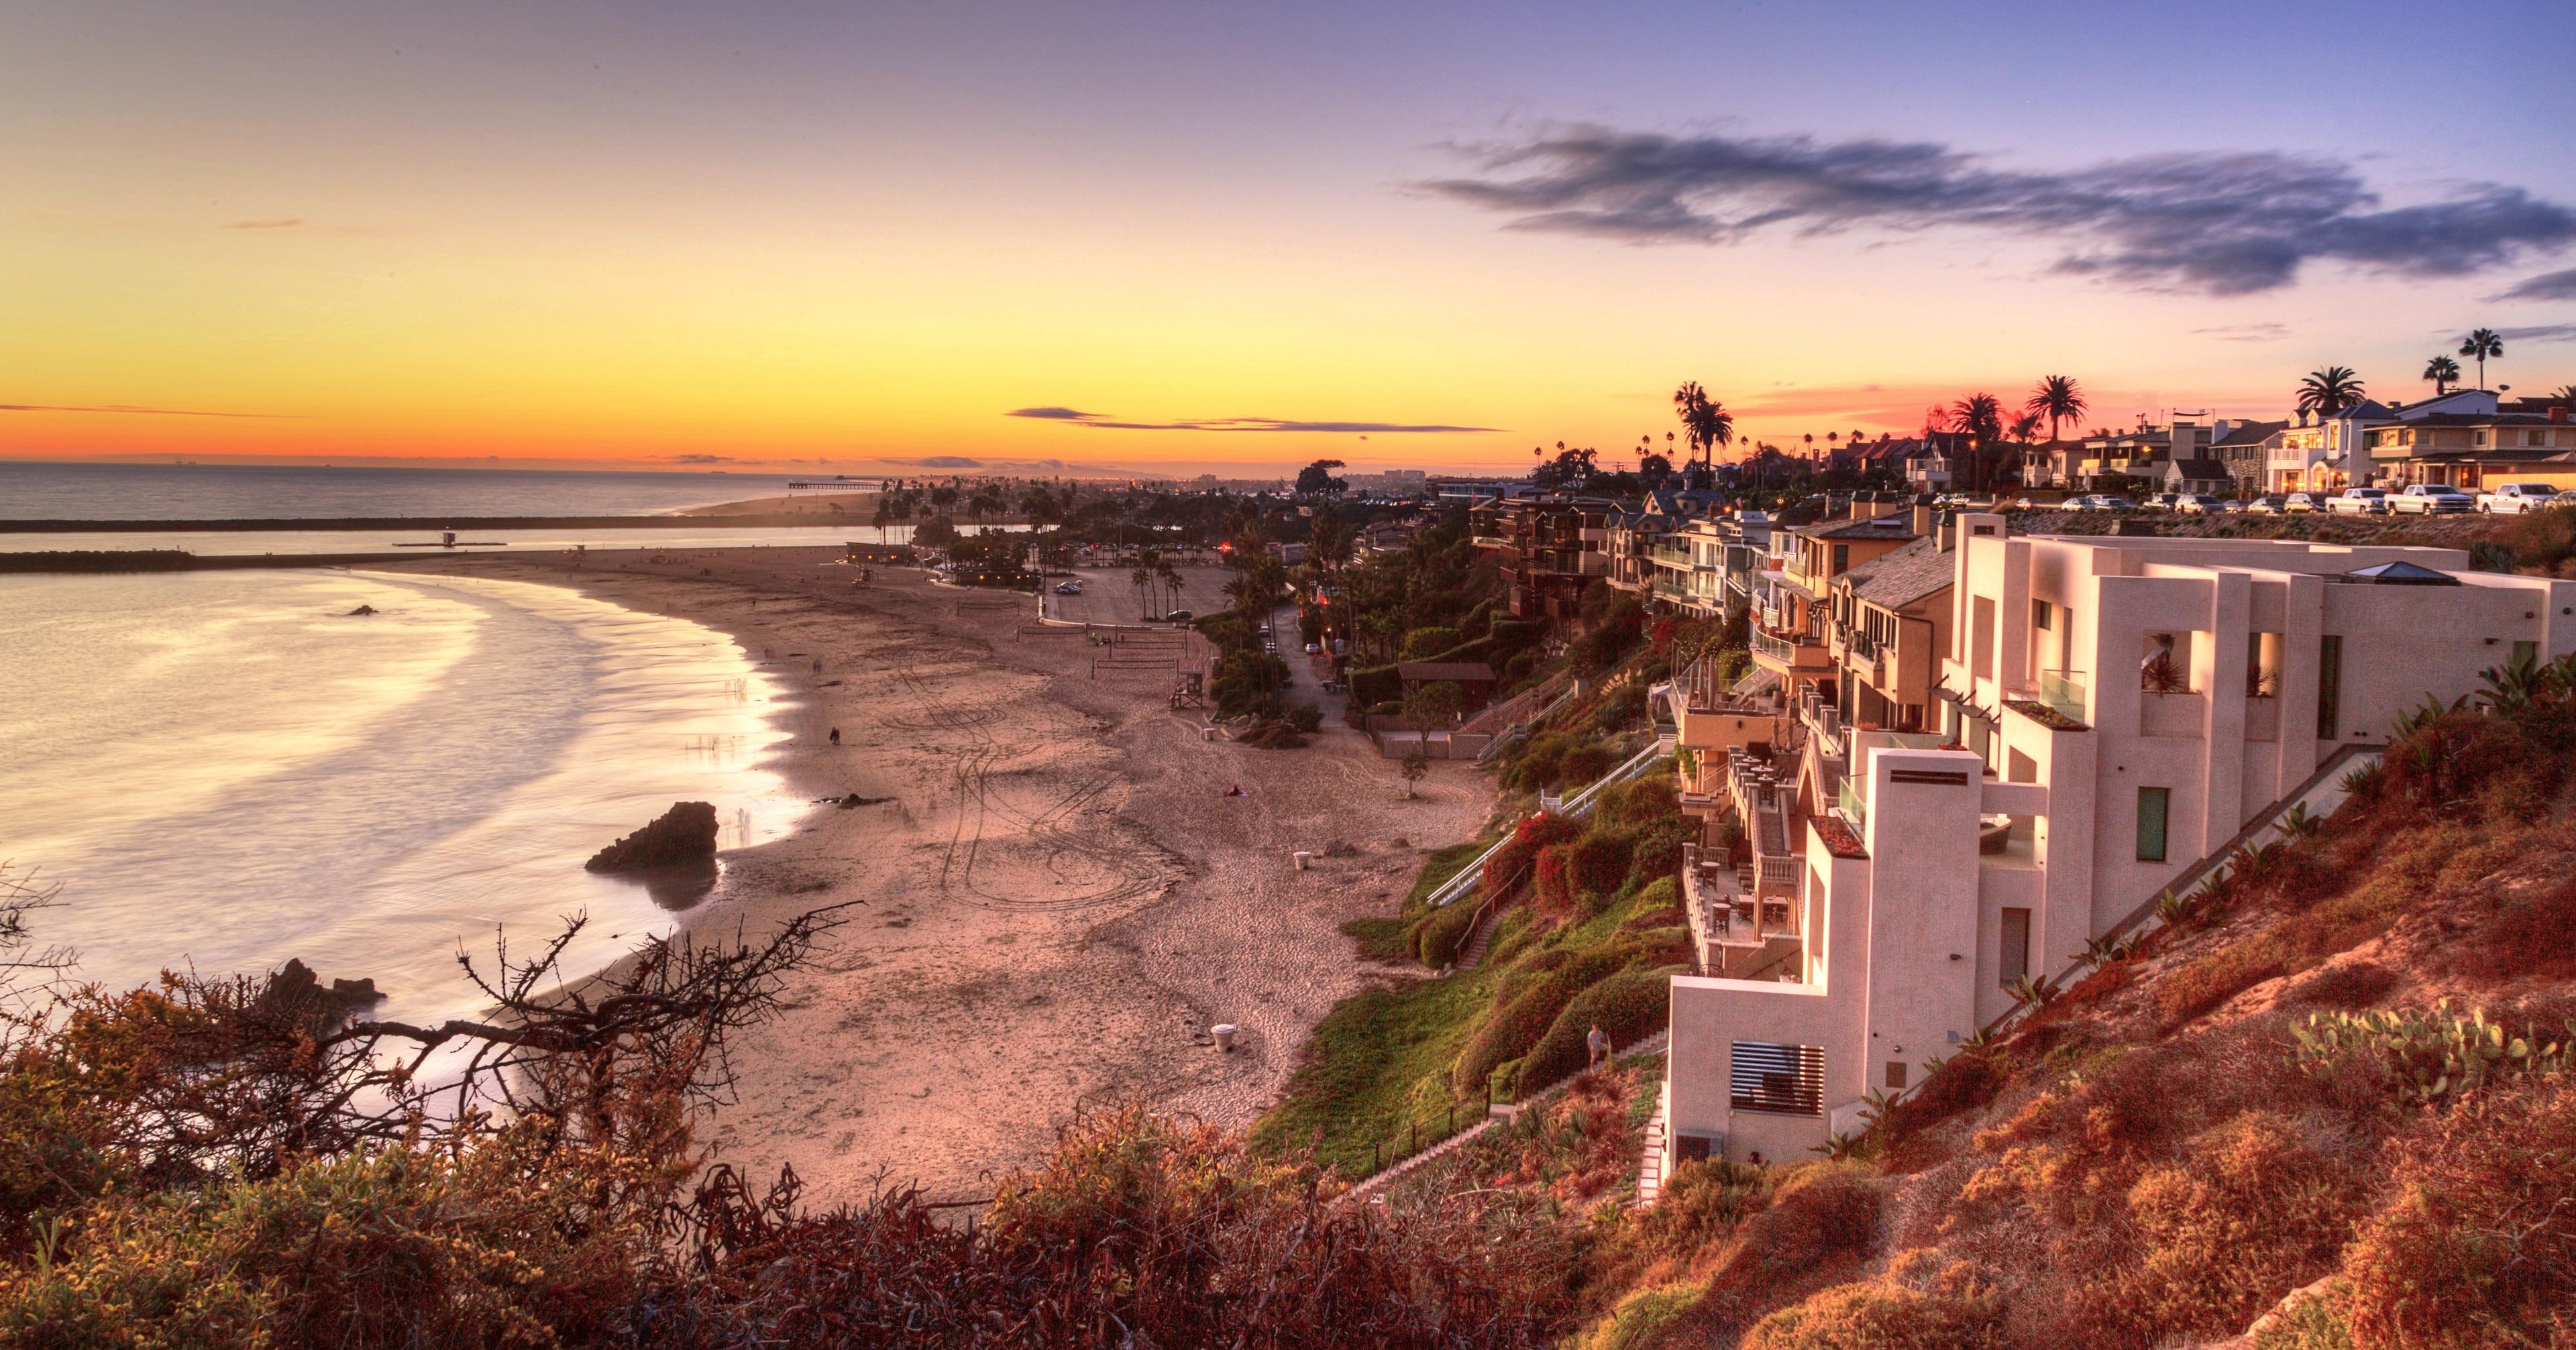 Corona, California, United States of America